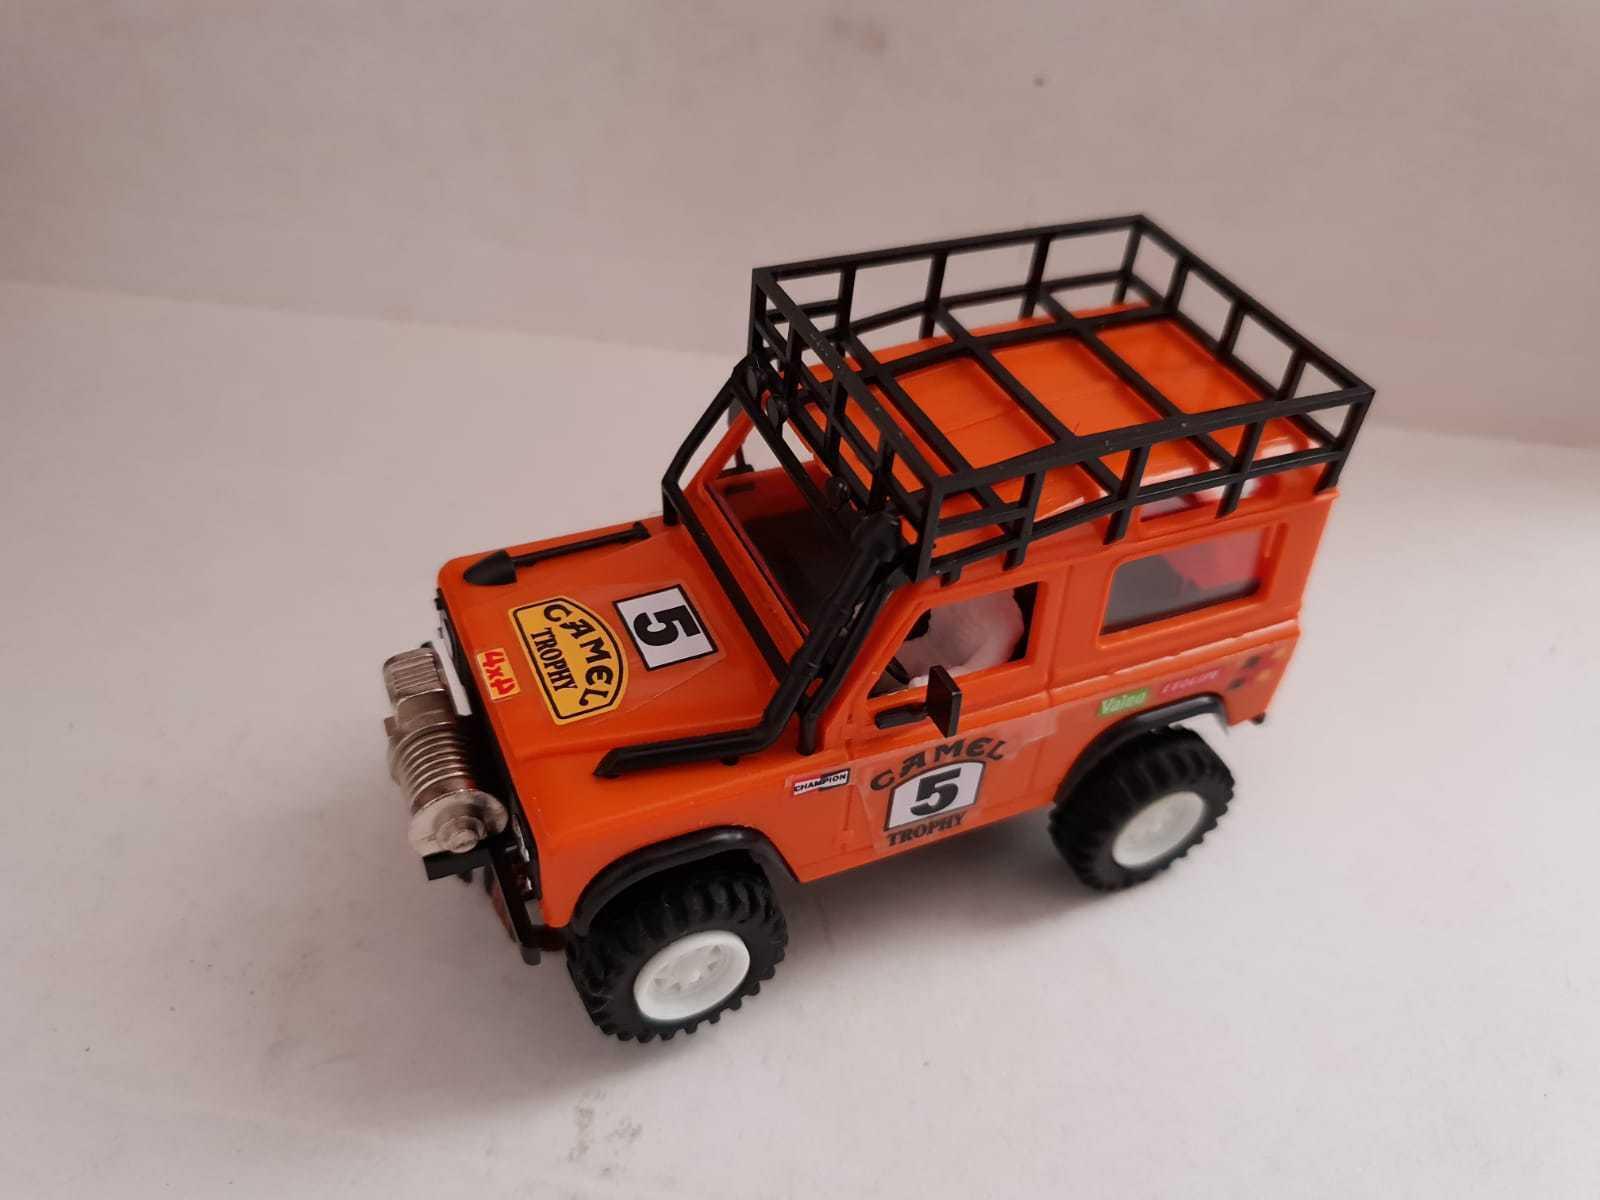 Scalextric Land Rover Sts orange